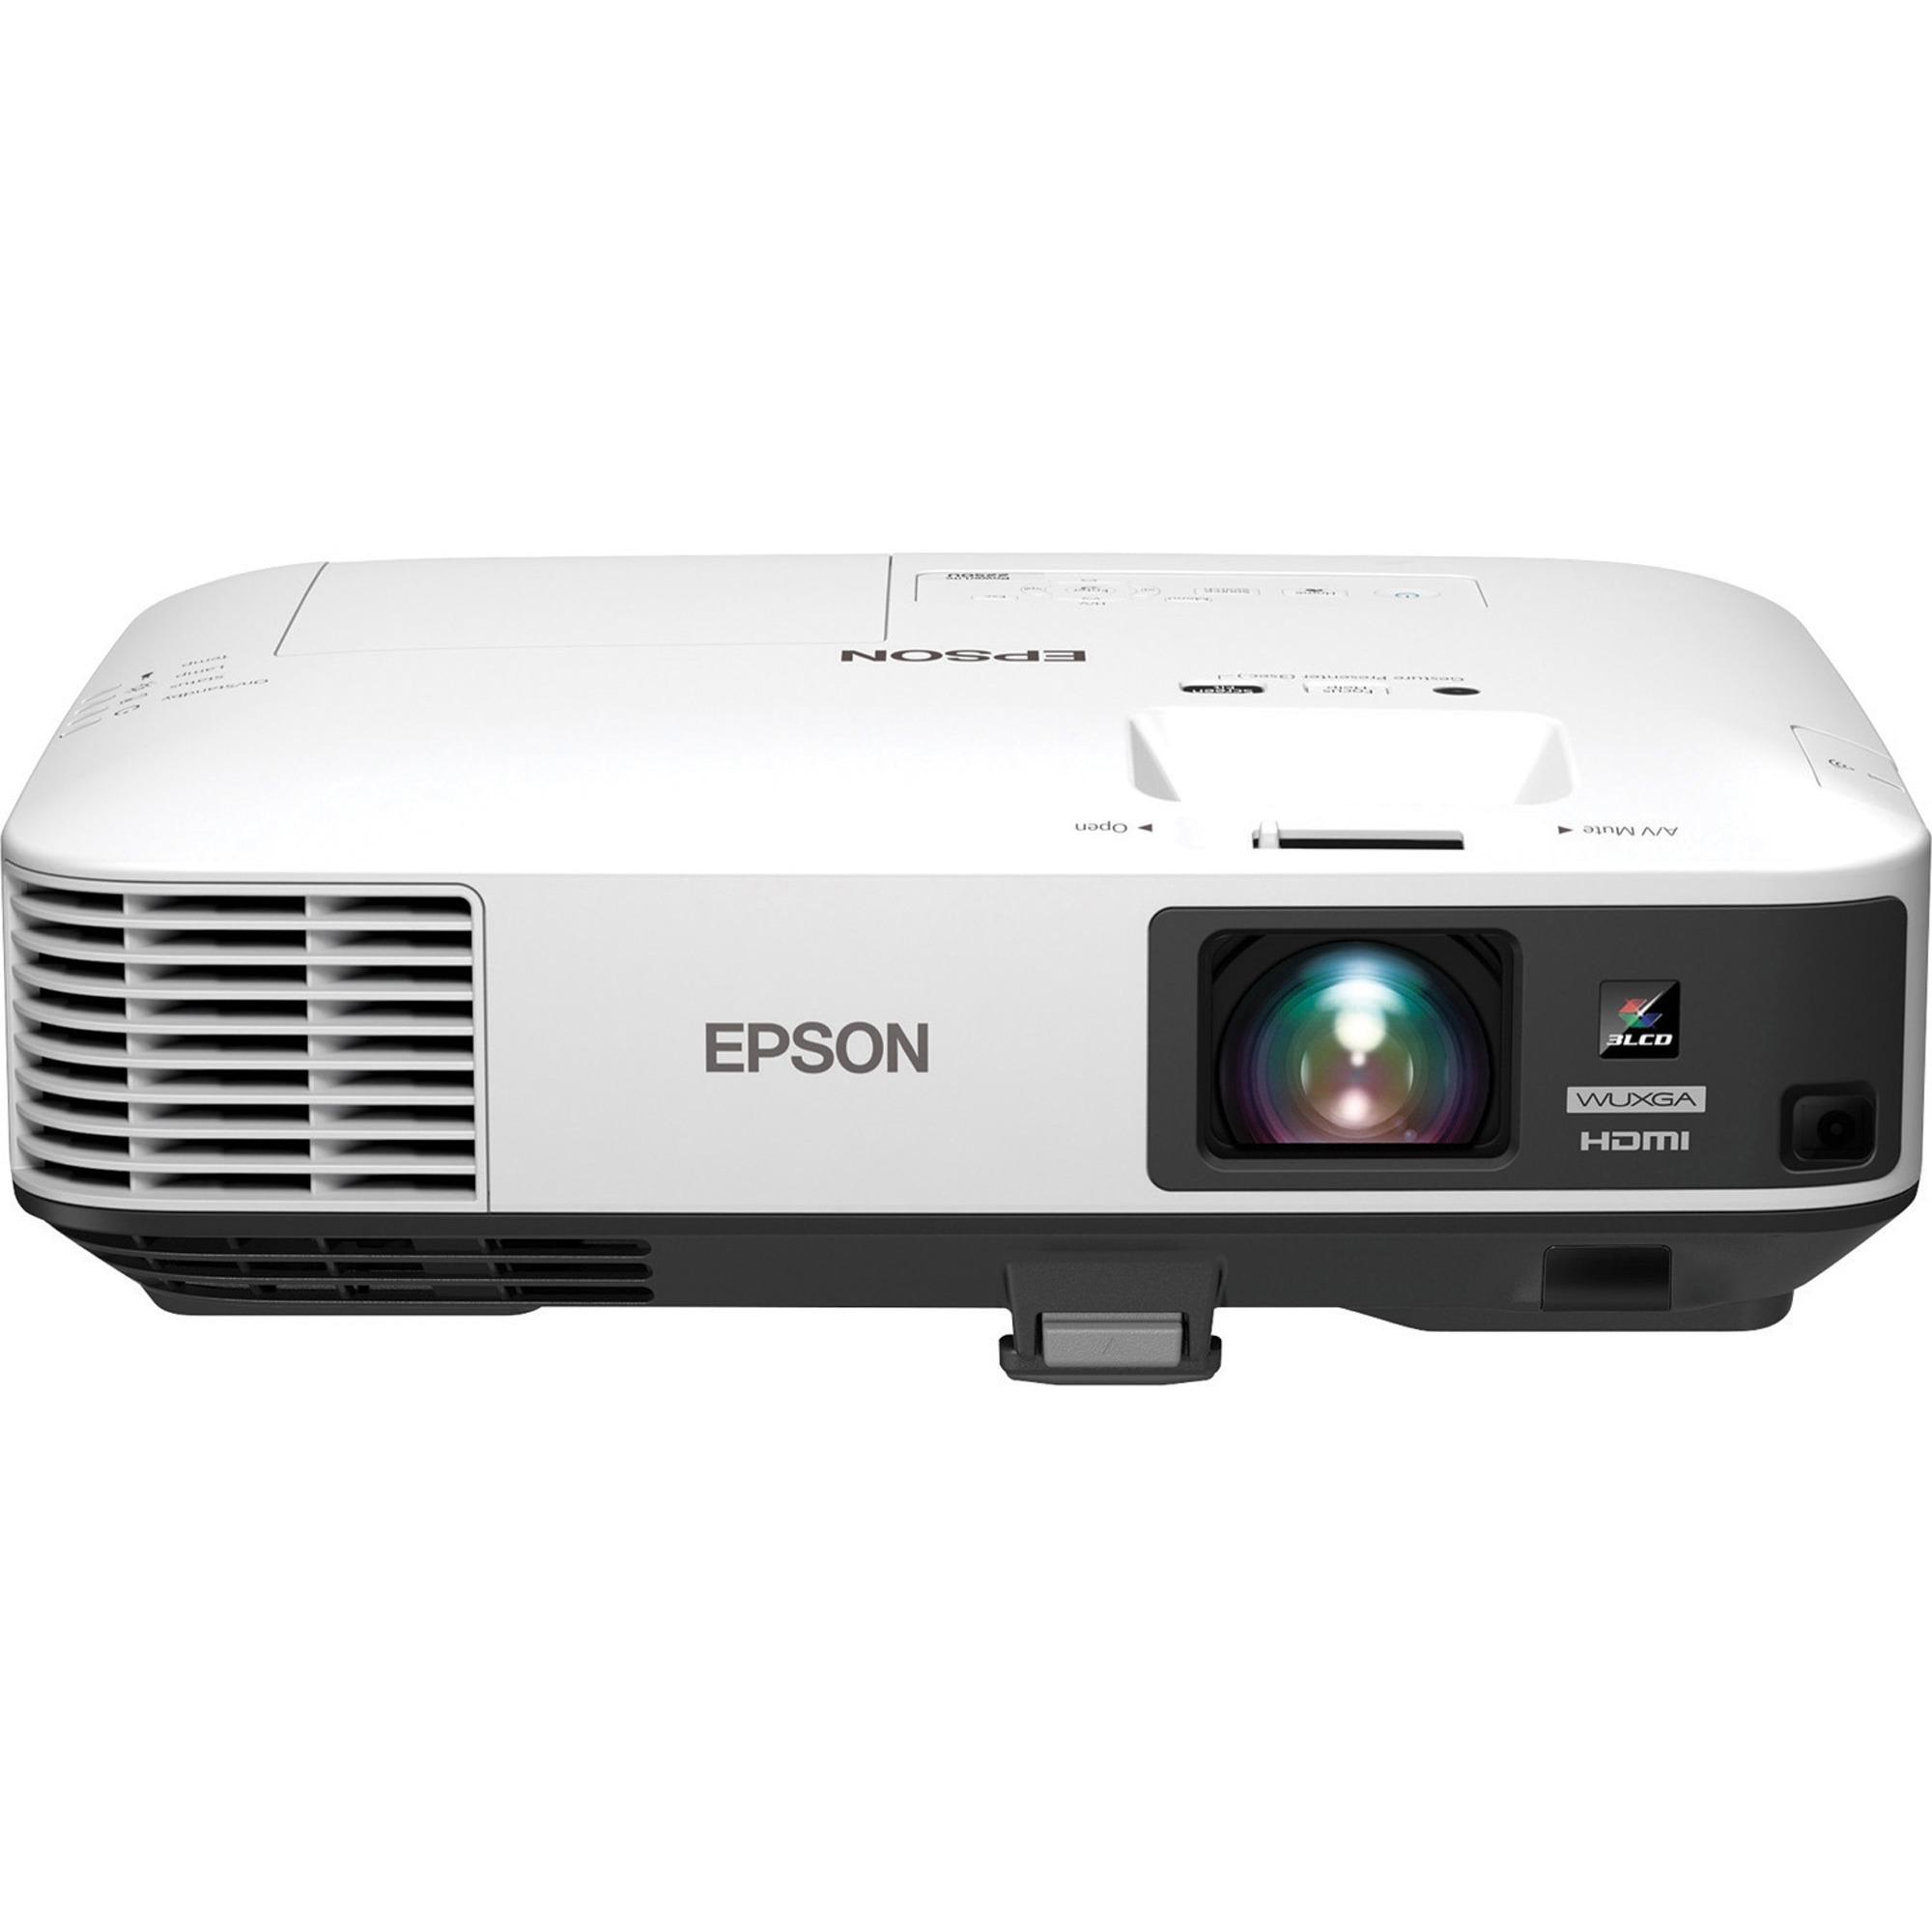 Epson PowerLite 2250U LCD Projector - 16:10_subImage_1